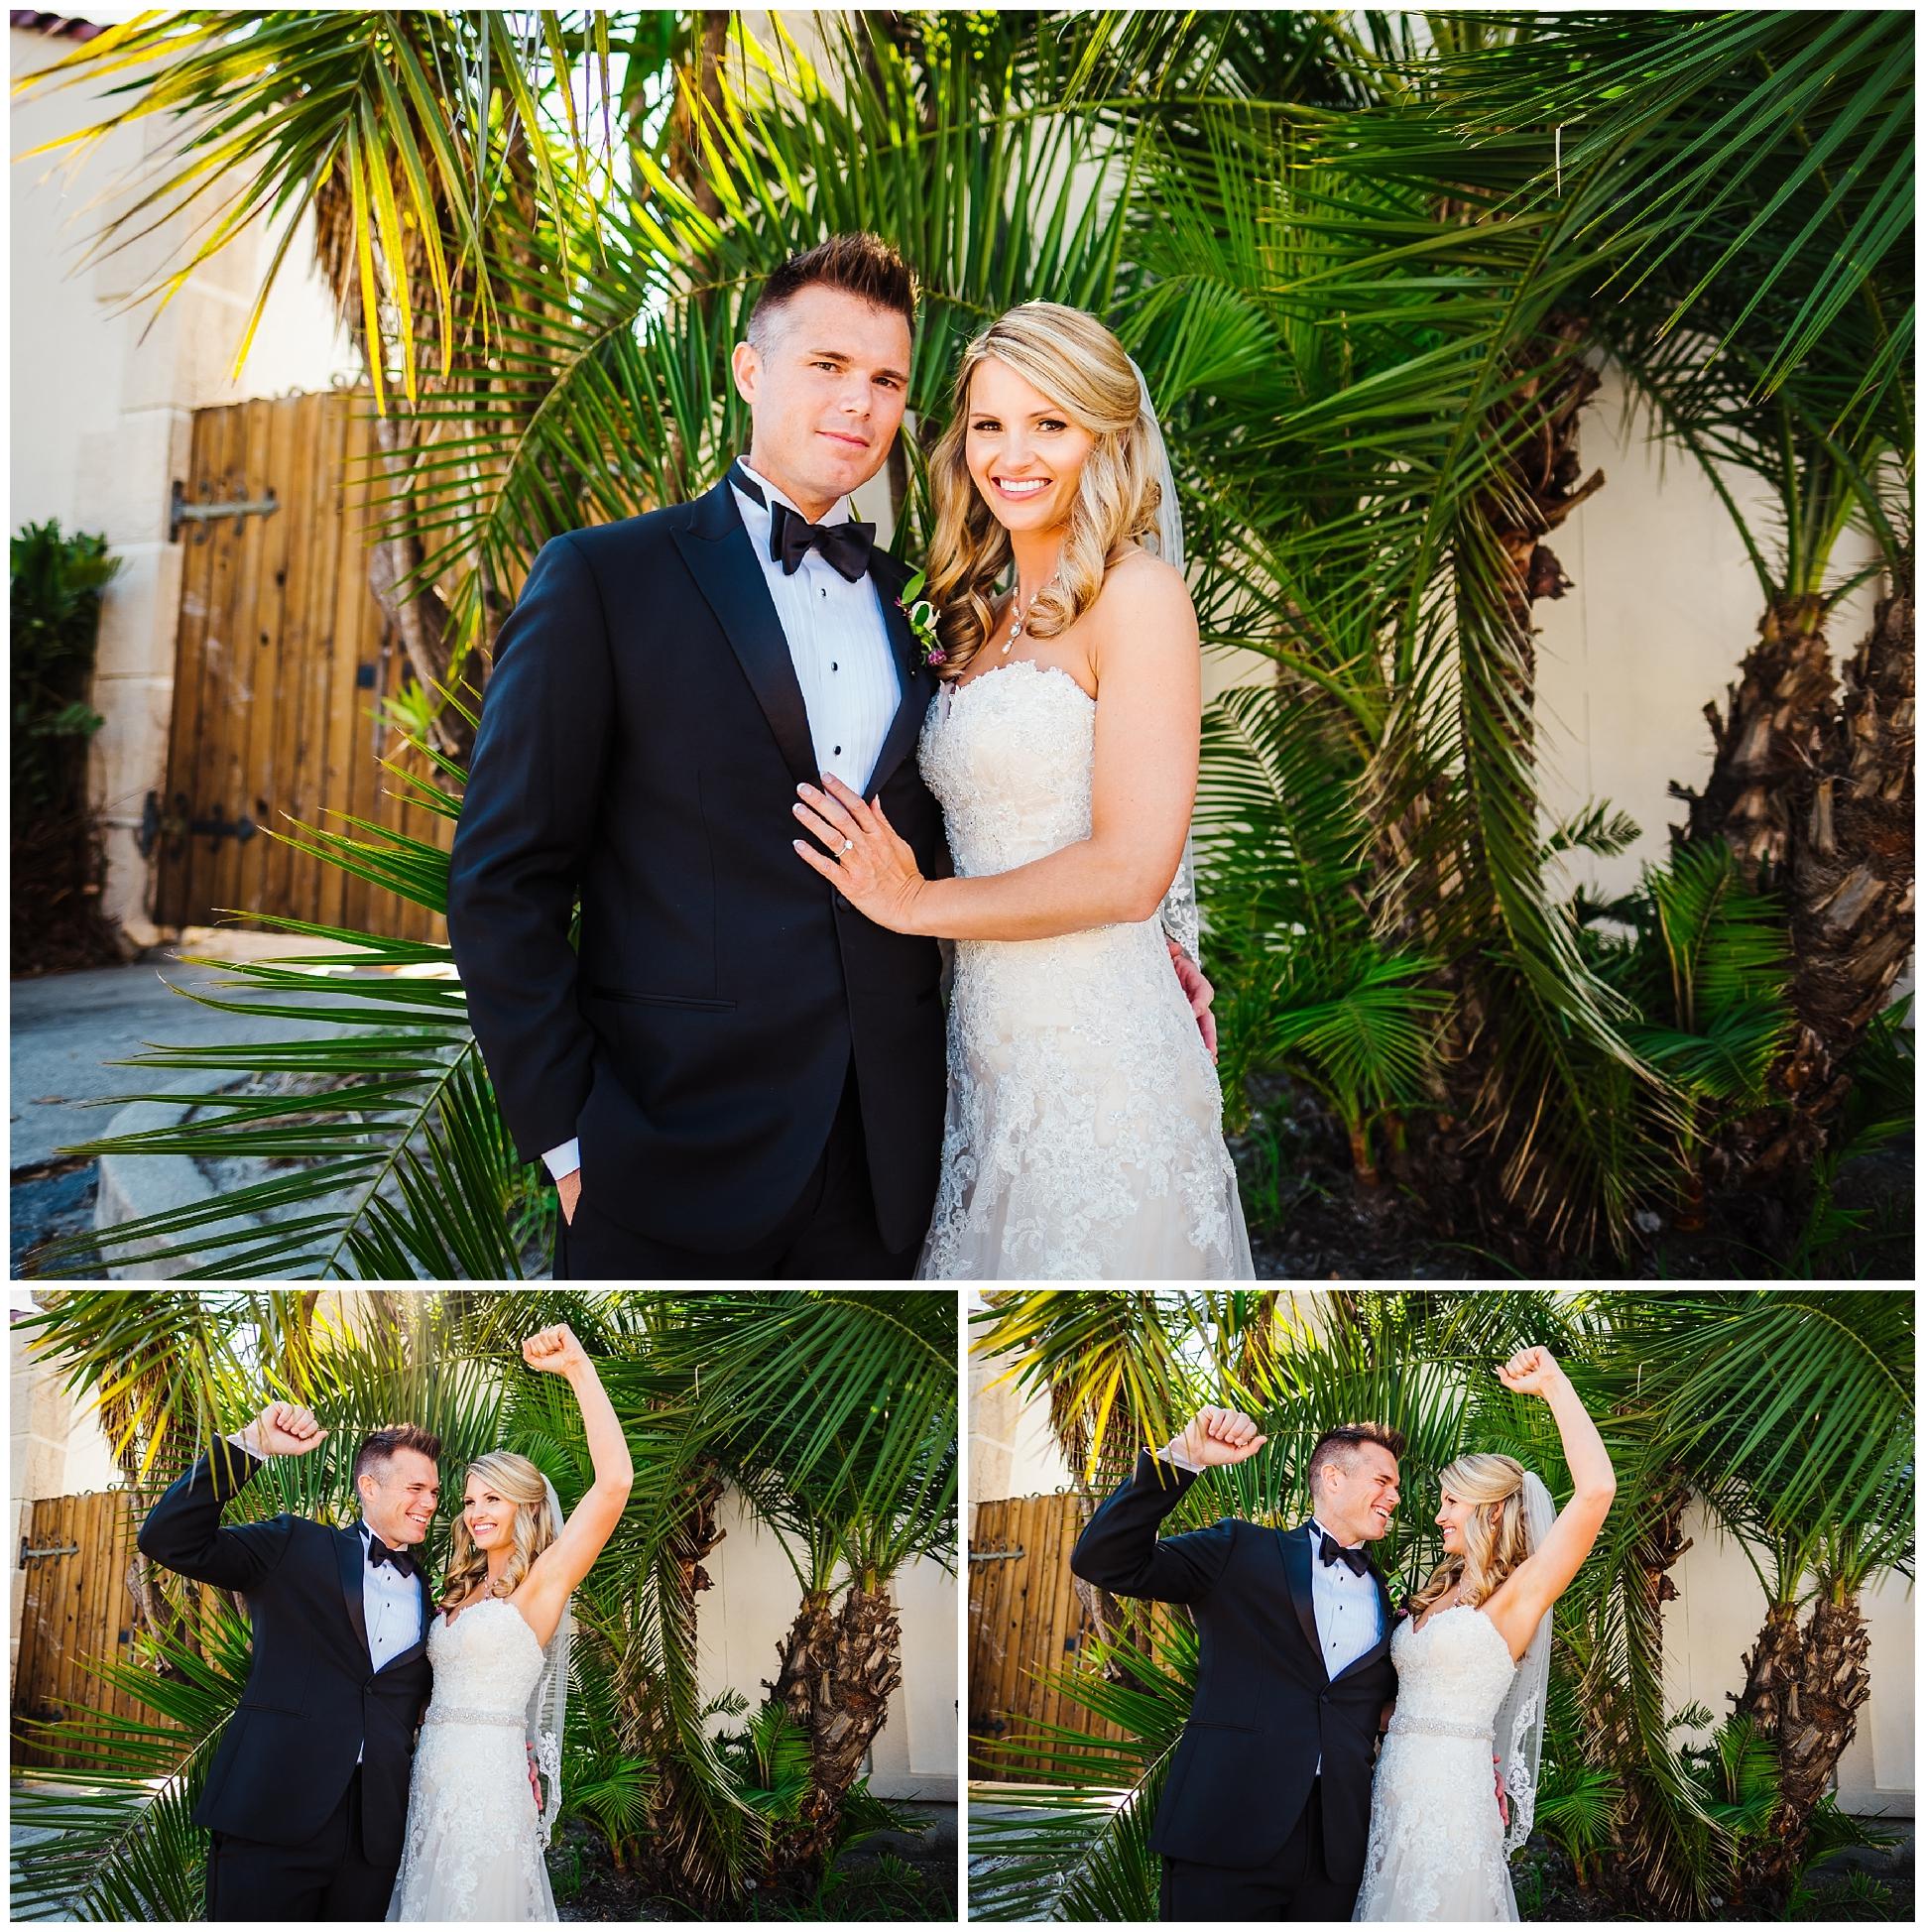 tampa-bradenton-wedding-photographer-south-florida-museum-classic-blush-gold-alpacas-sparklers_0041.jpg